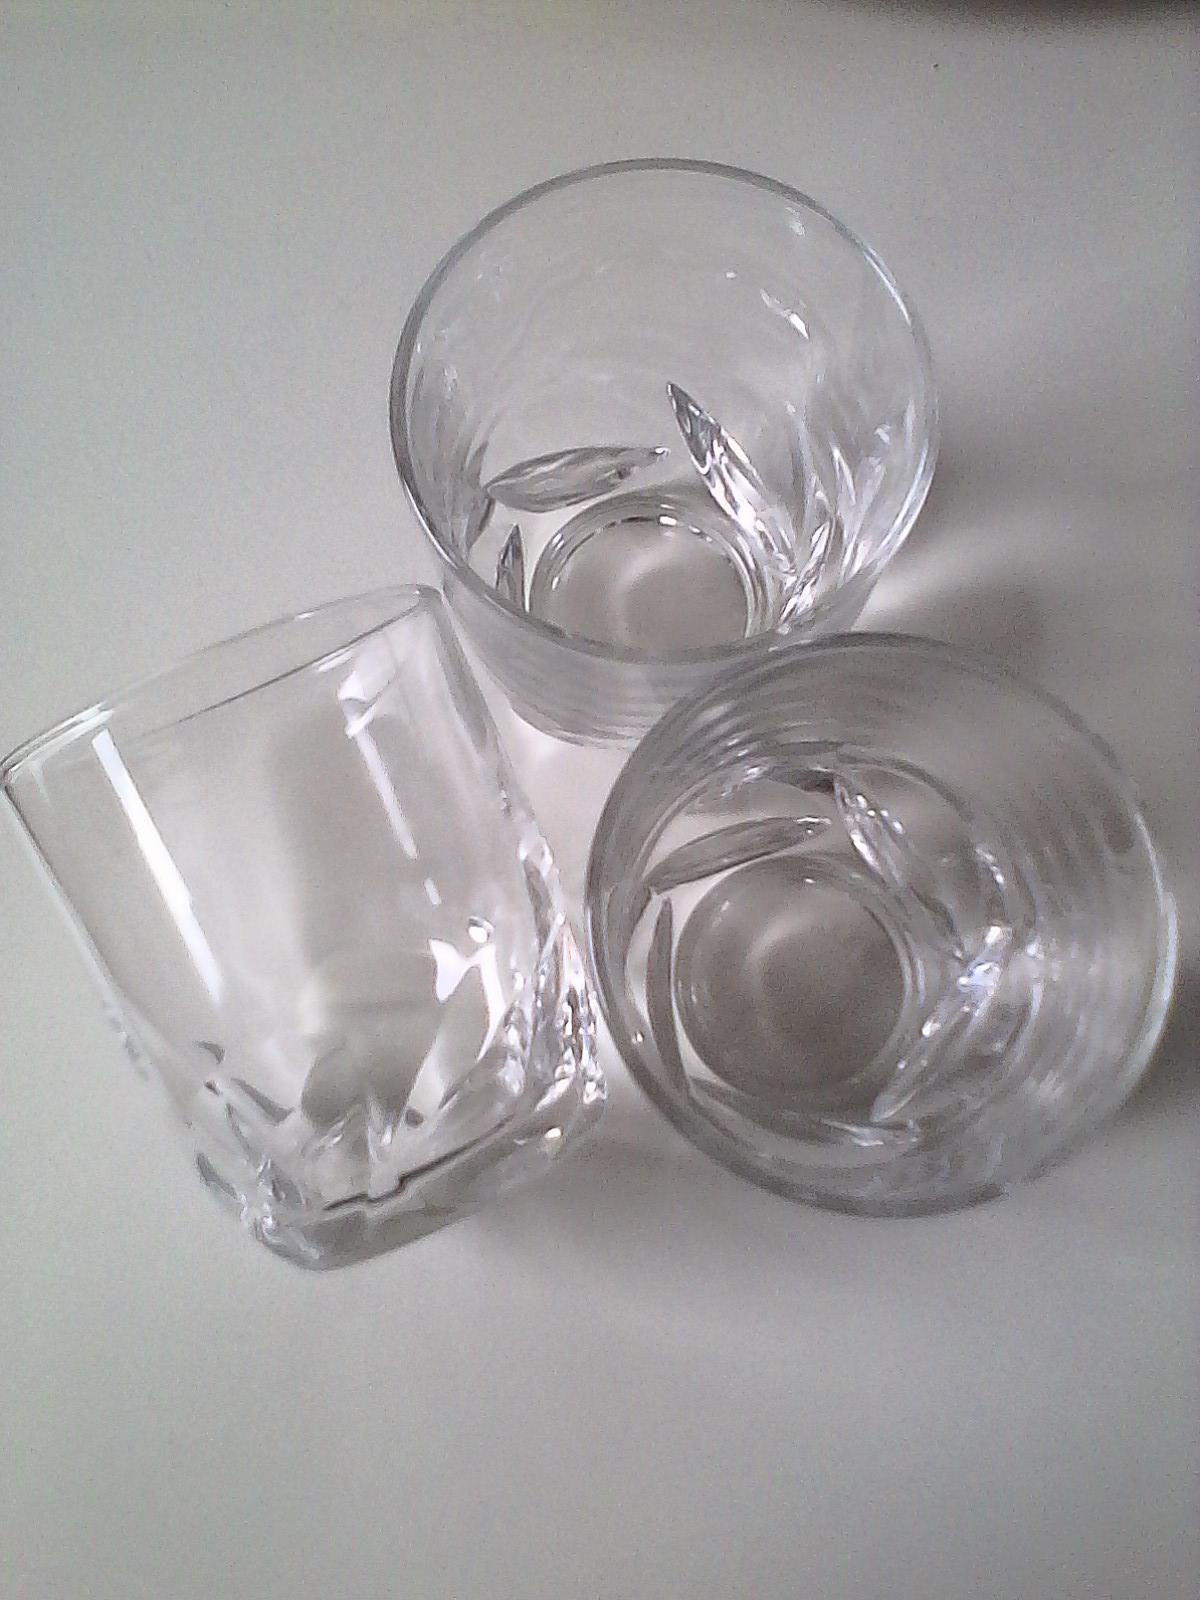 troc de troc verre type cantine x3 image 0